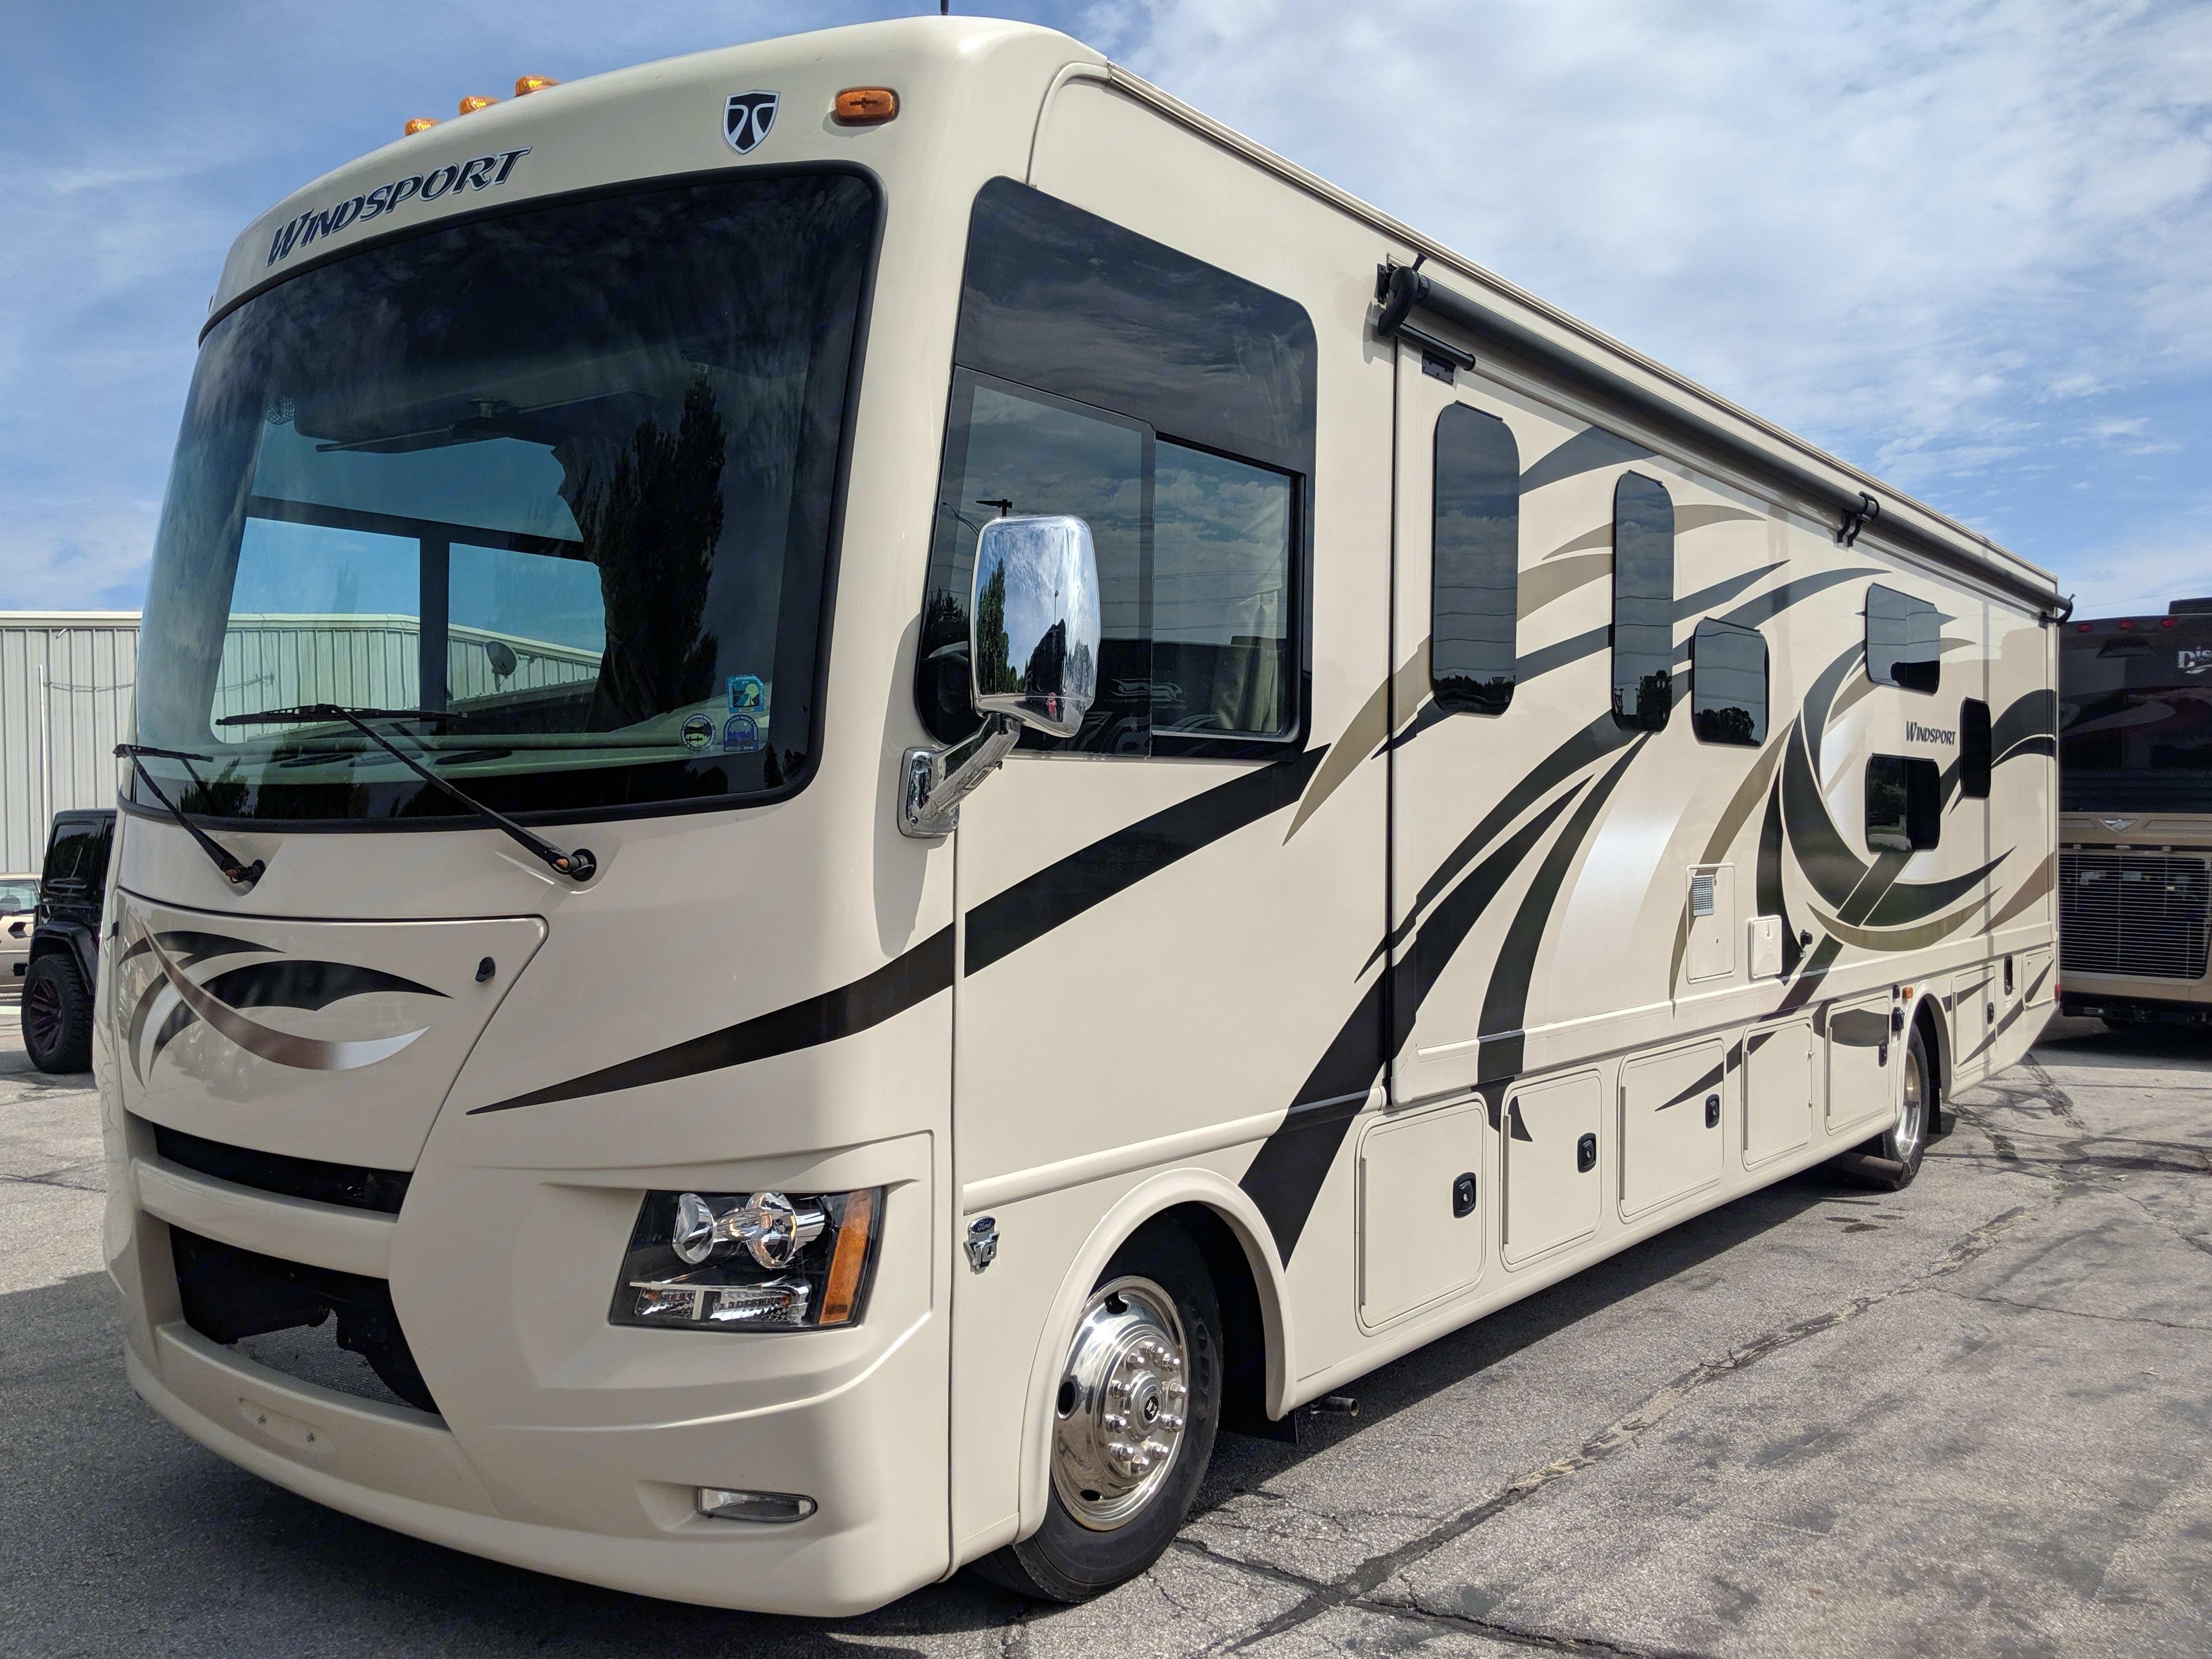 RV Exterior. Thor Motor Coach Windsport 2016